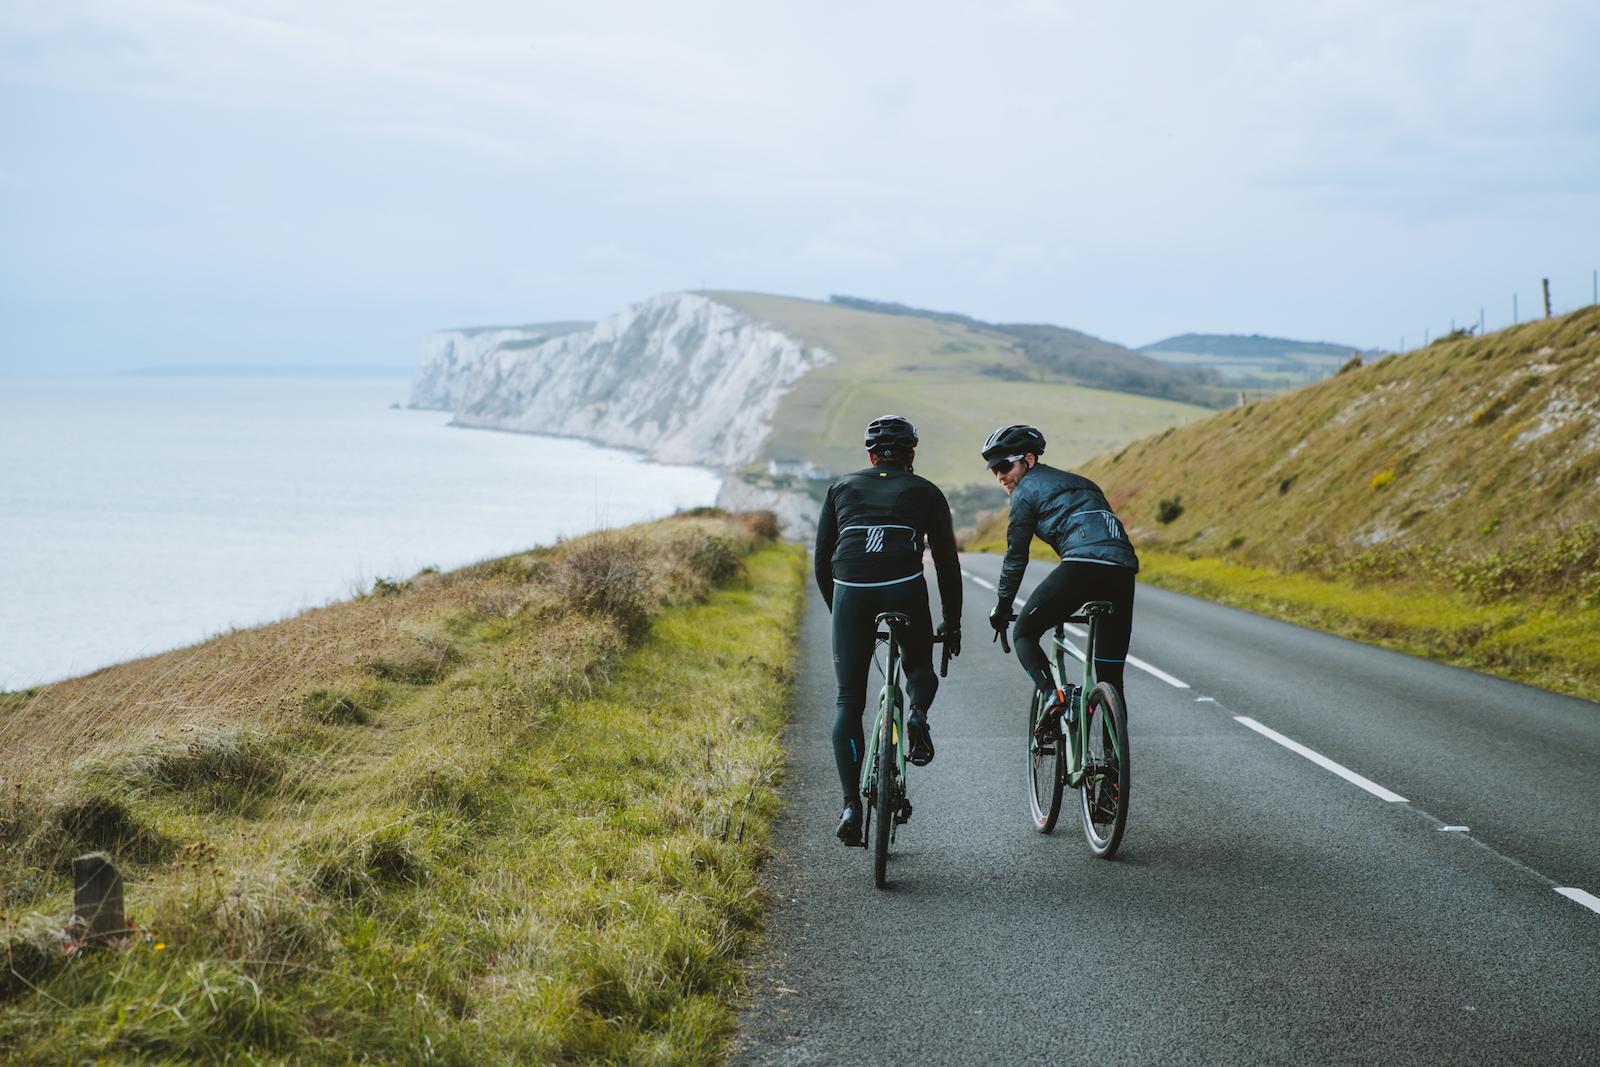 Tim Wiggins Isle of Wight Cycling